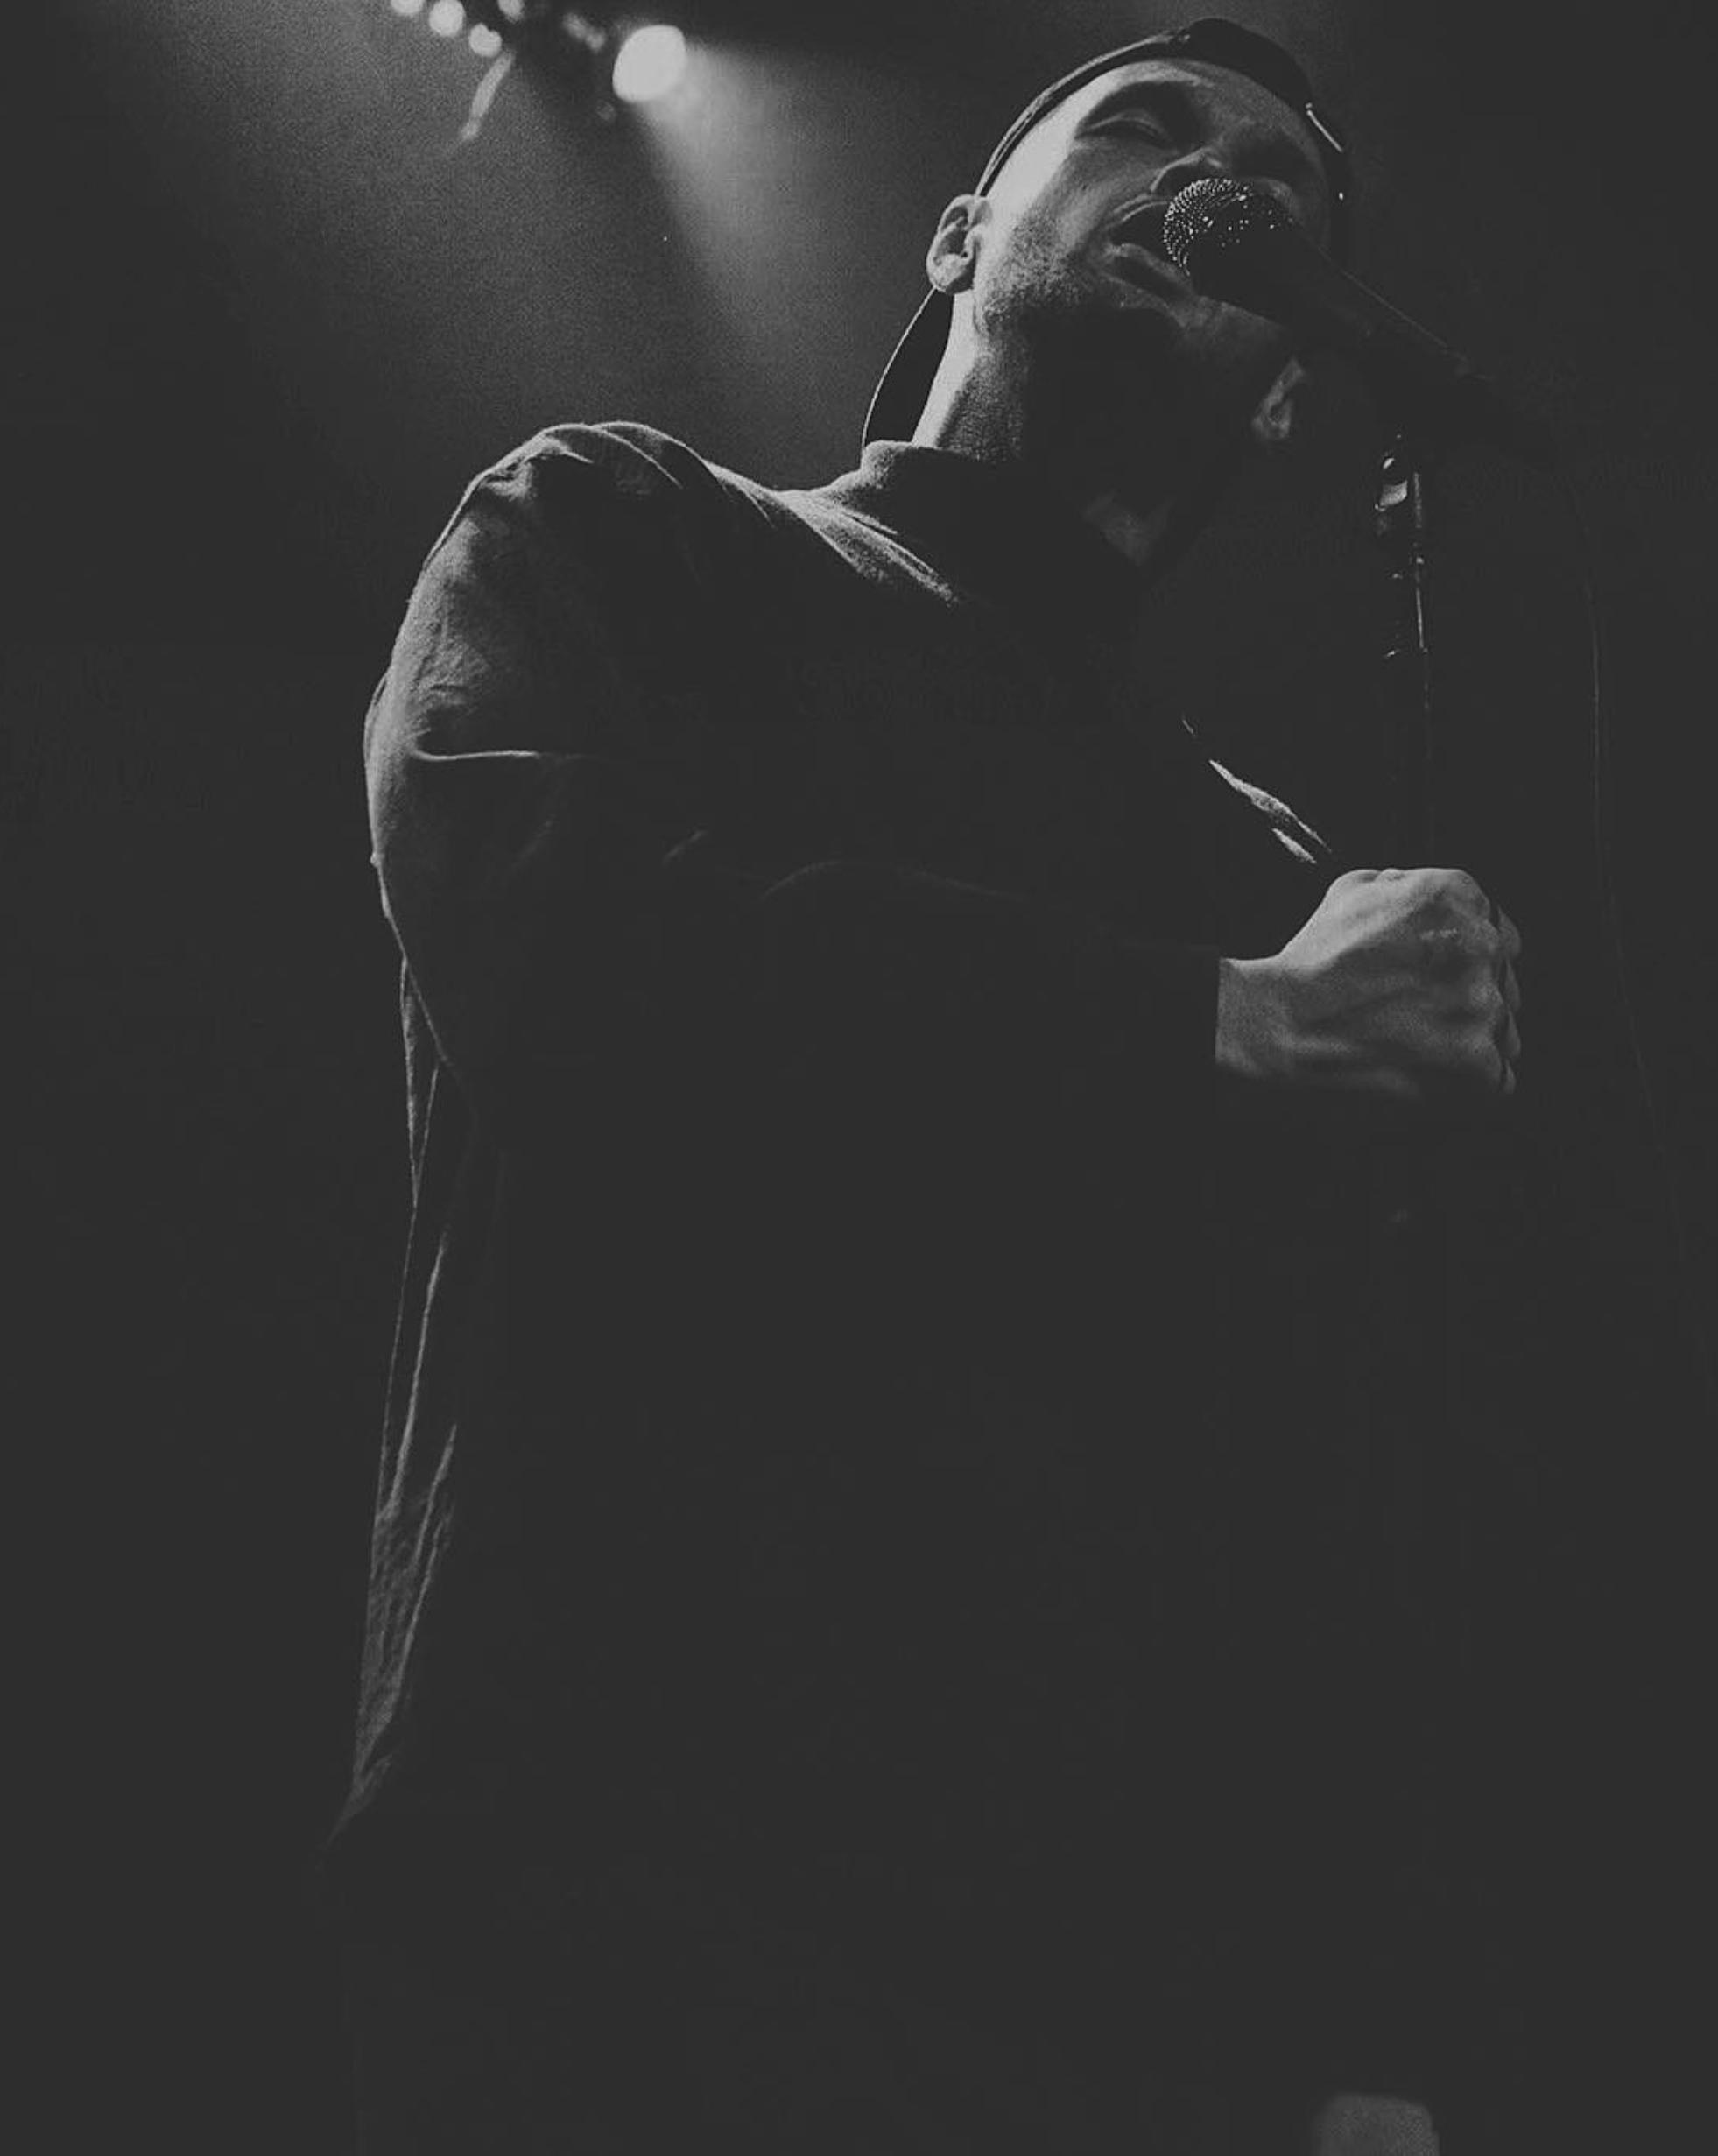 Sammy_johnson_live.png